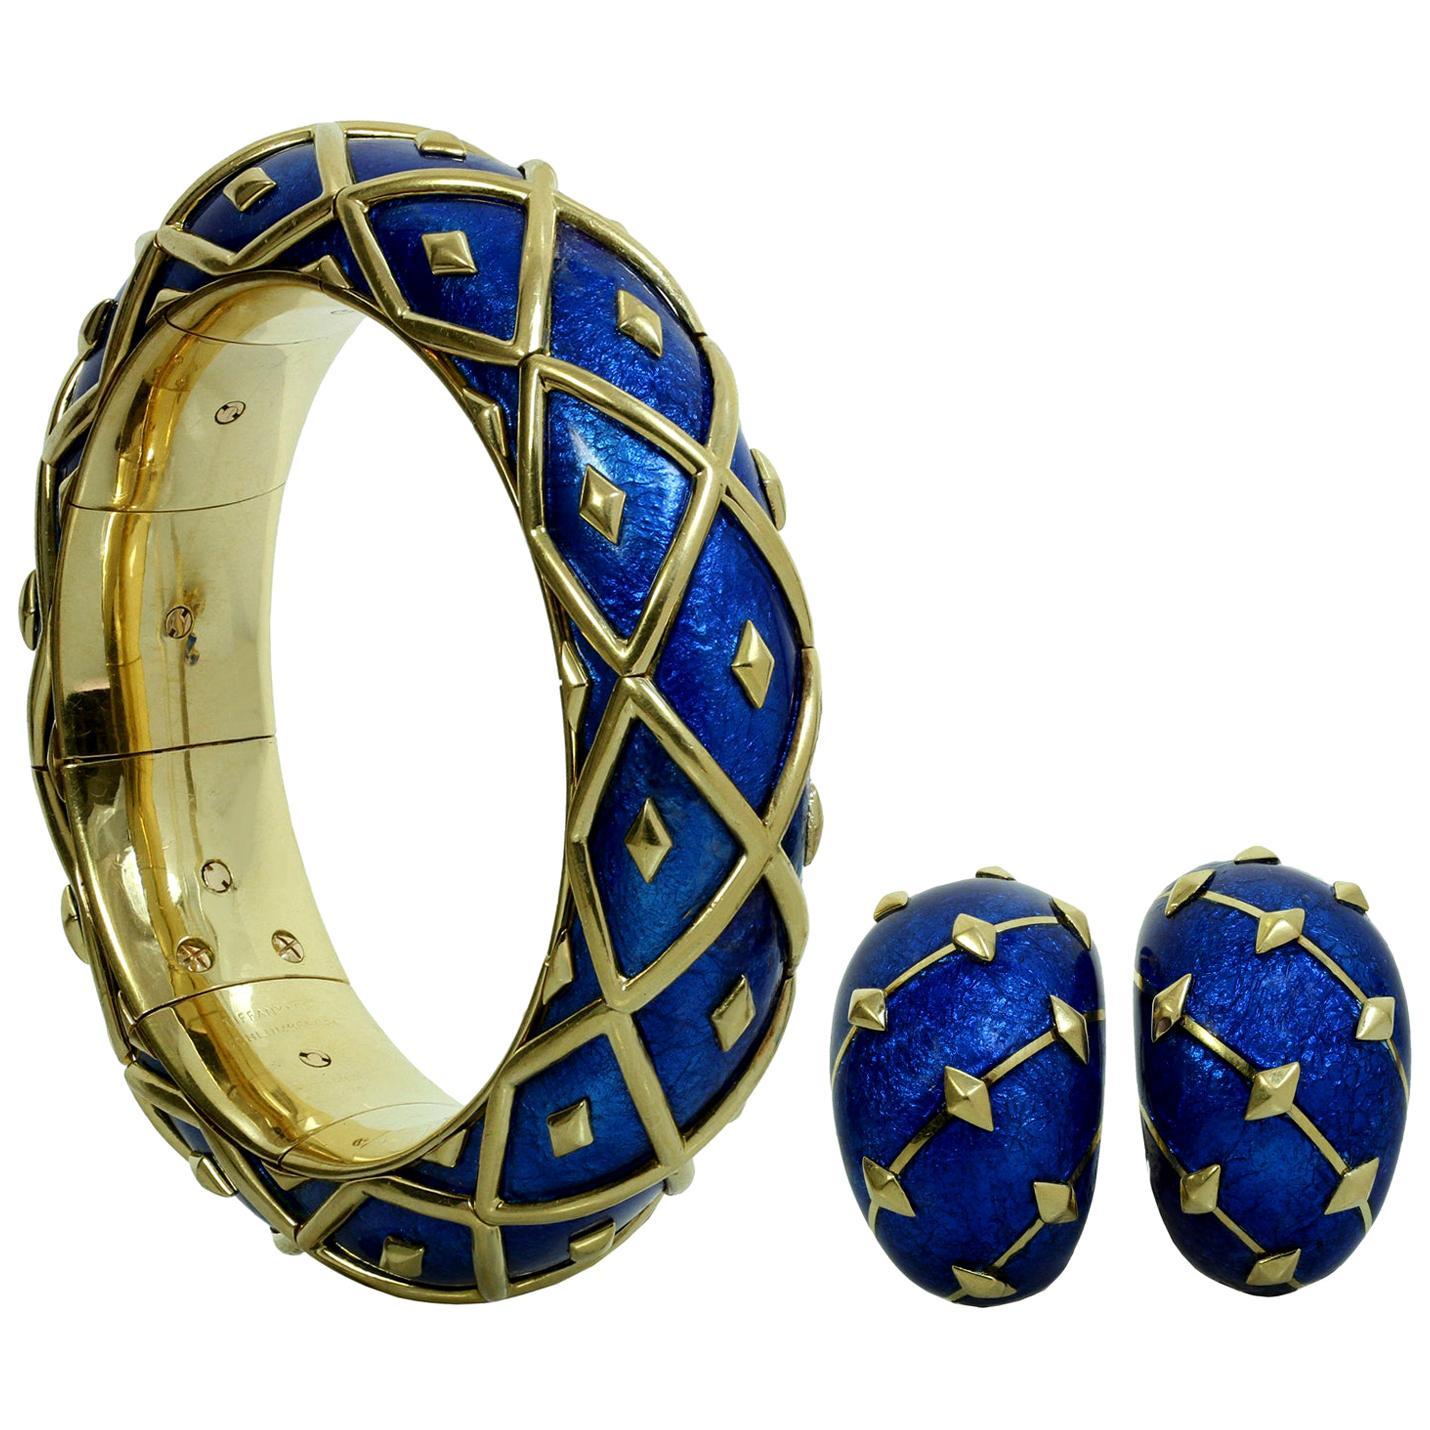 Tiffany & Co. Schlumberger Dot Losange Blue Enamel Bangle Bracelet and Earrings